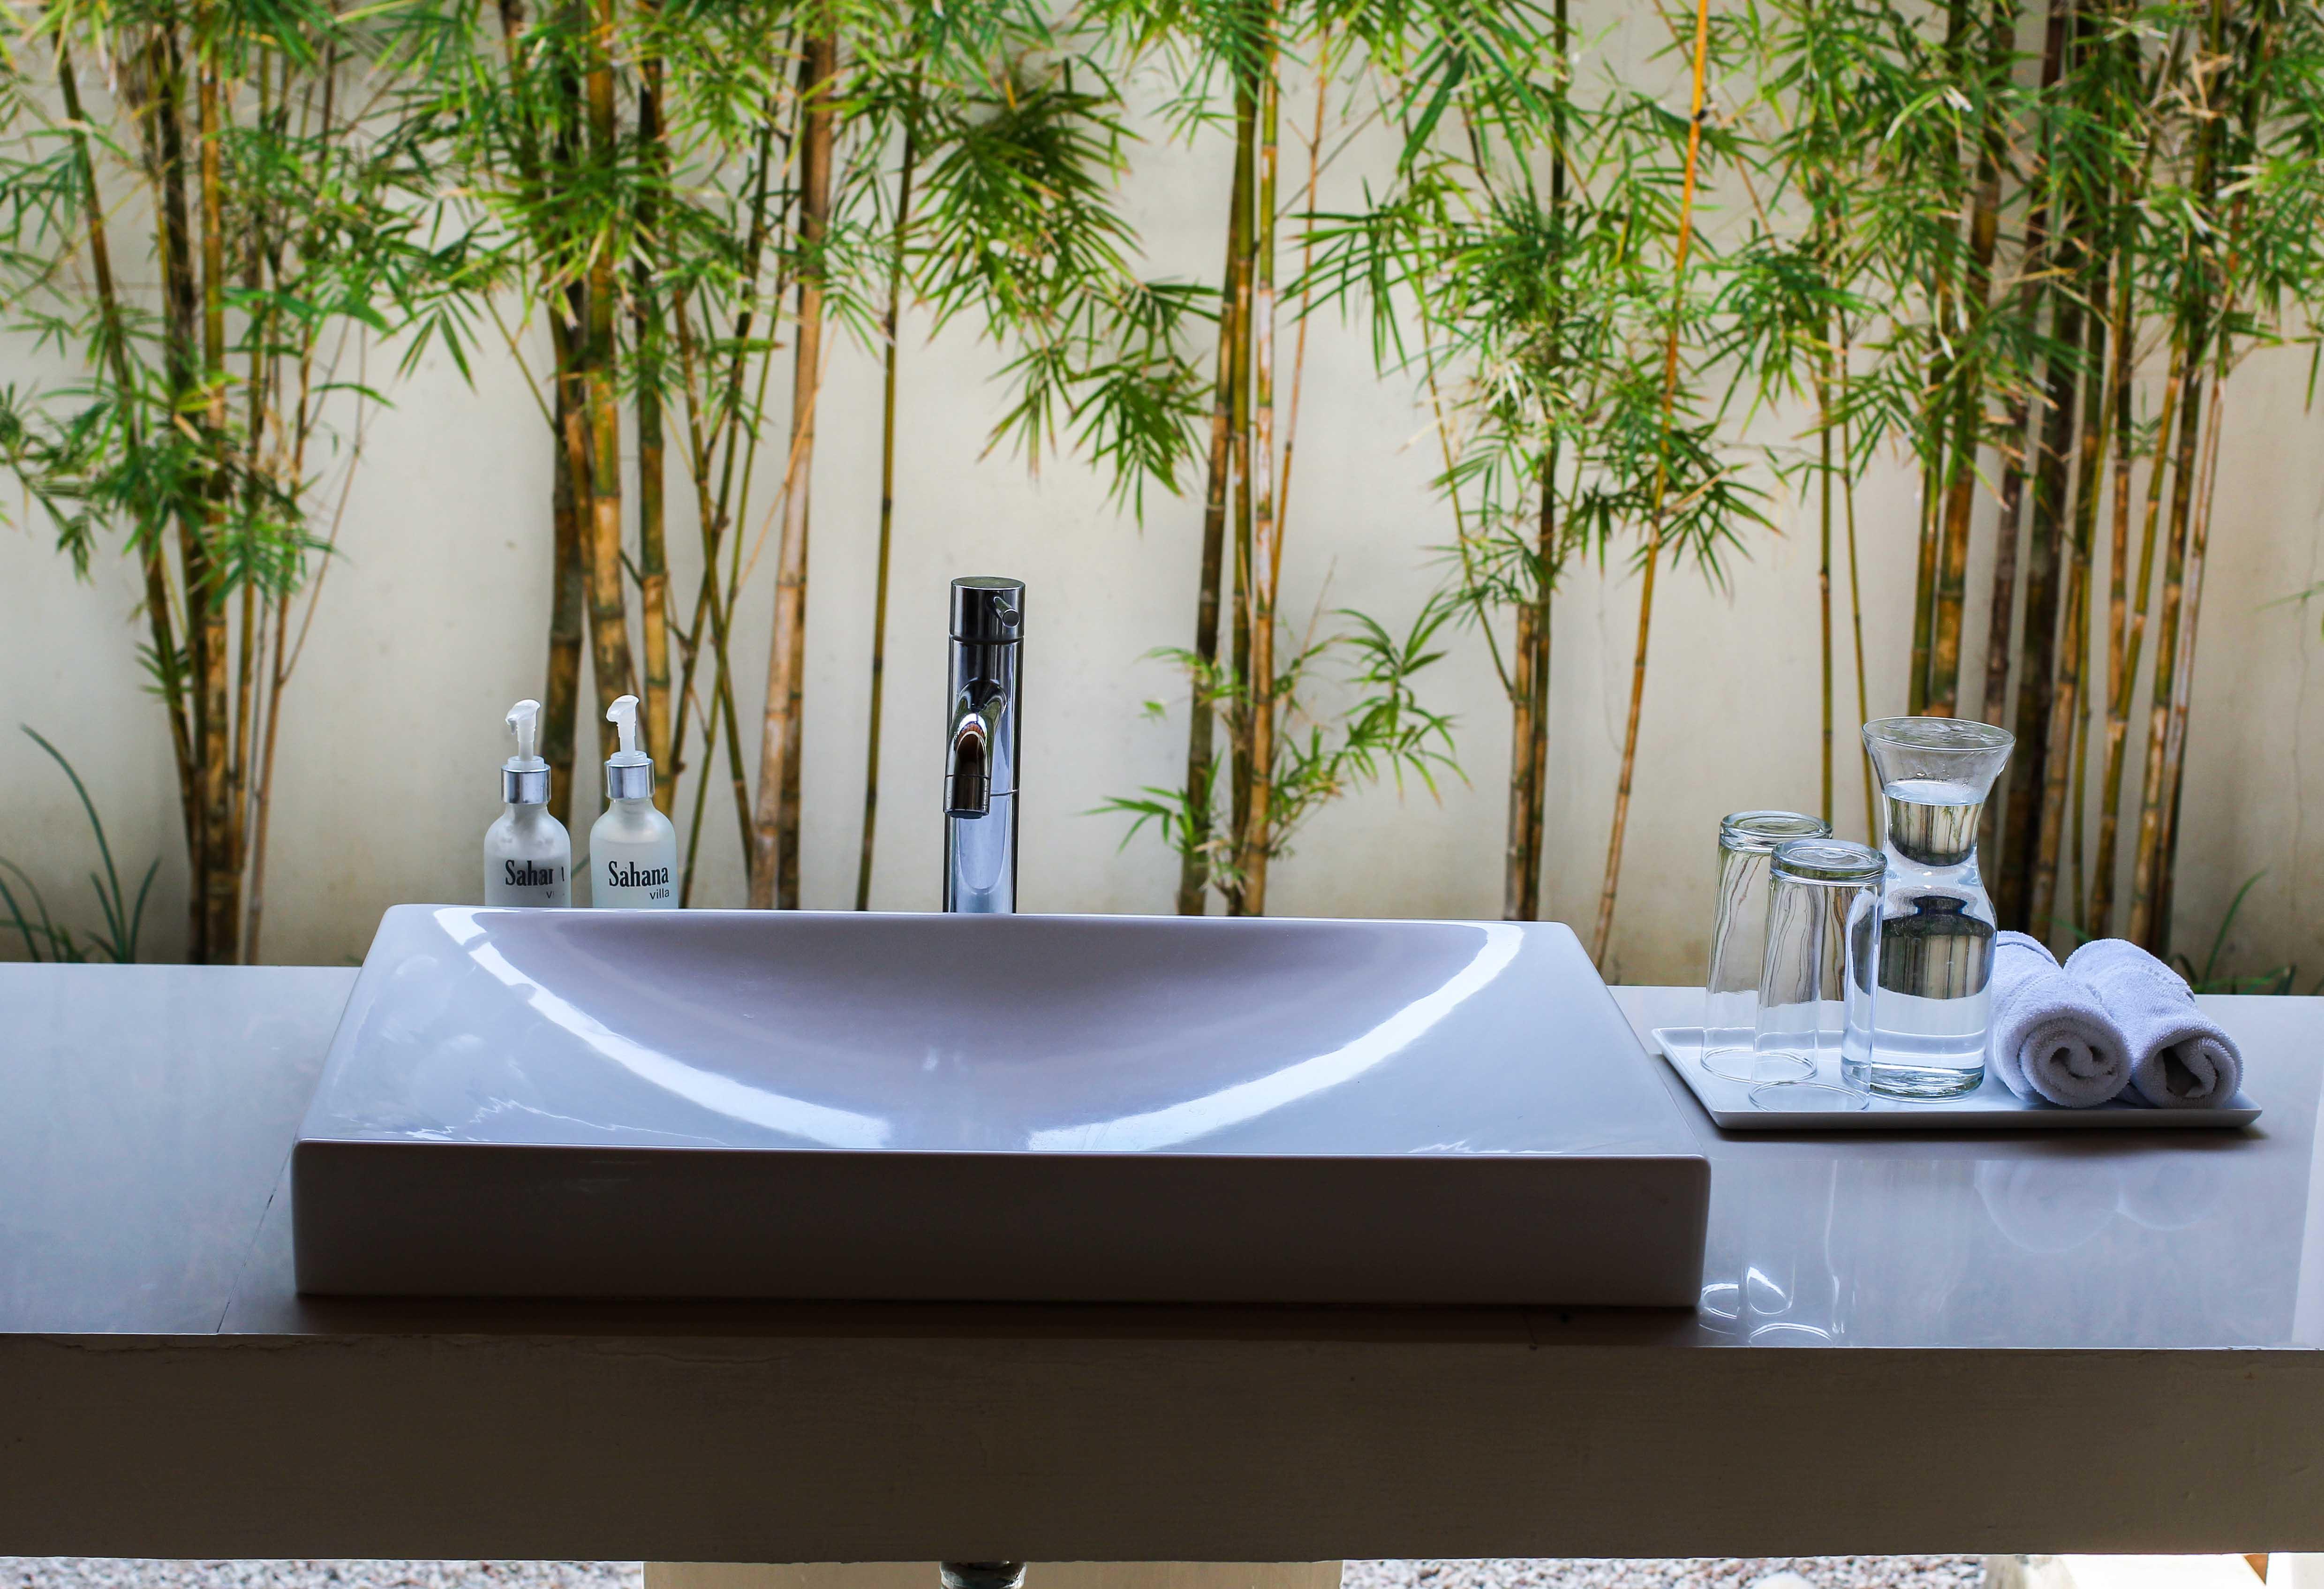 Sahana Villas Seminyak Poolvilla 3 Bedroom Seminyak Bali Luxusvilla mieten Badezimmer Waschbecken Reiseblogger